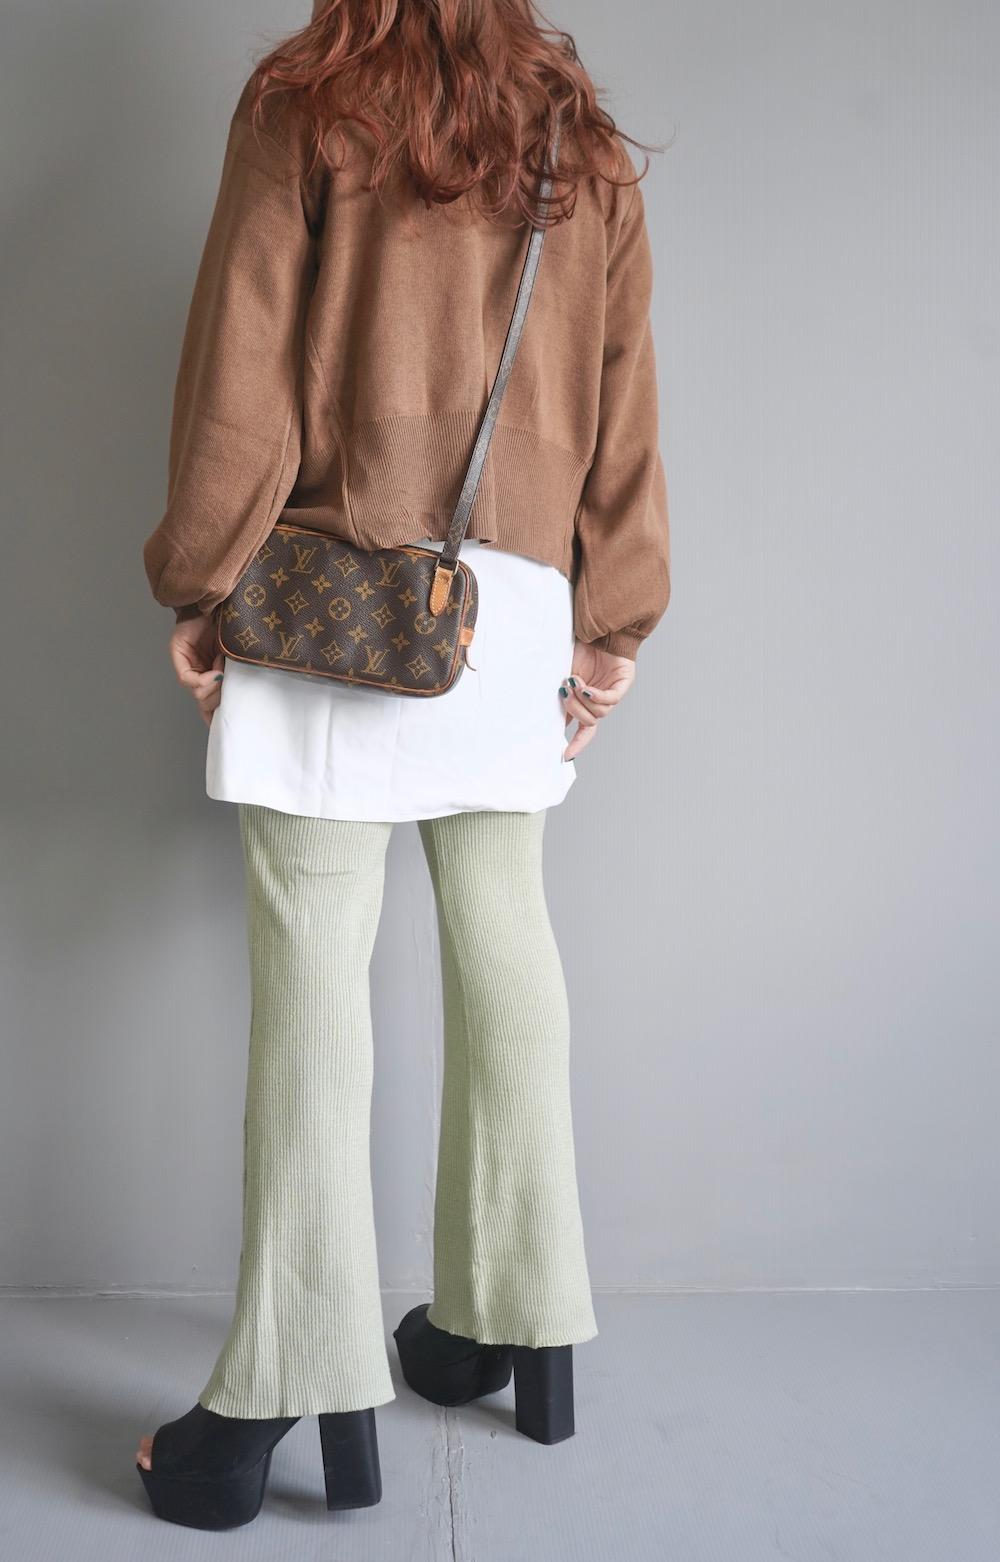 Balloon Sleeve V-Neck Knit Cardigan (brown)